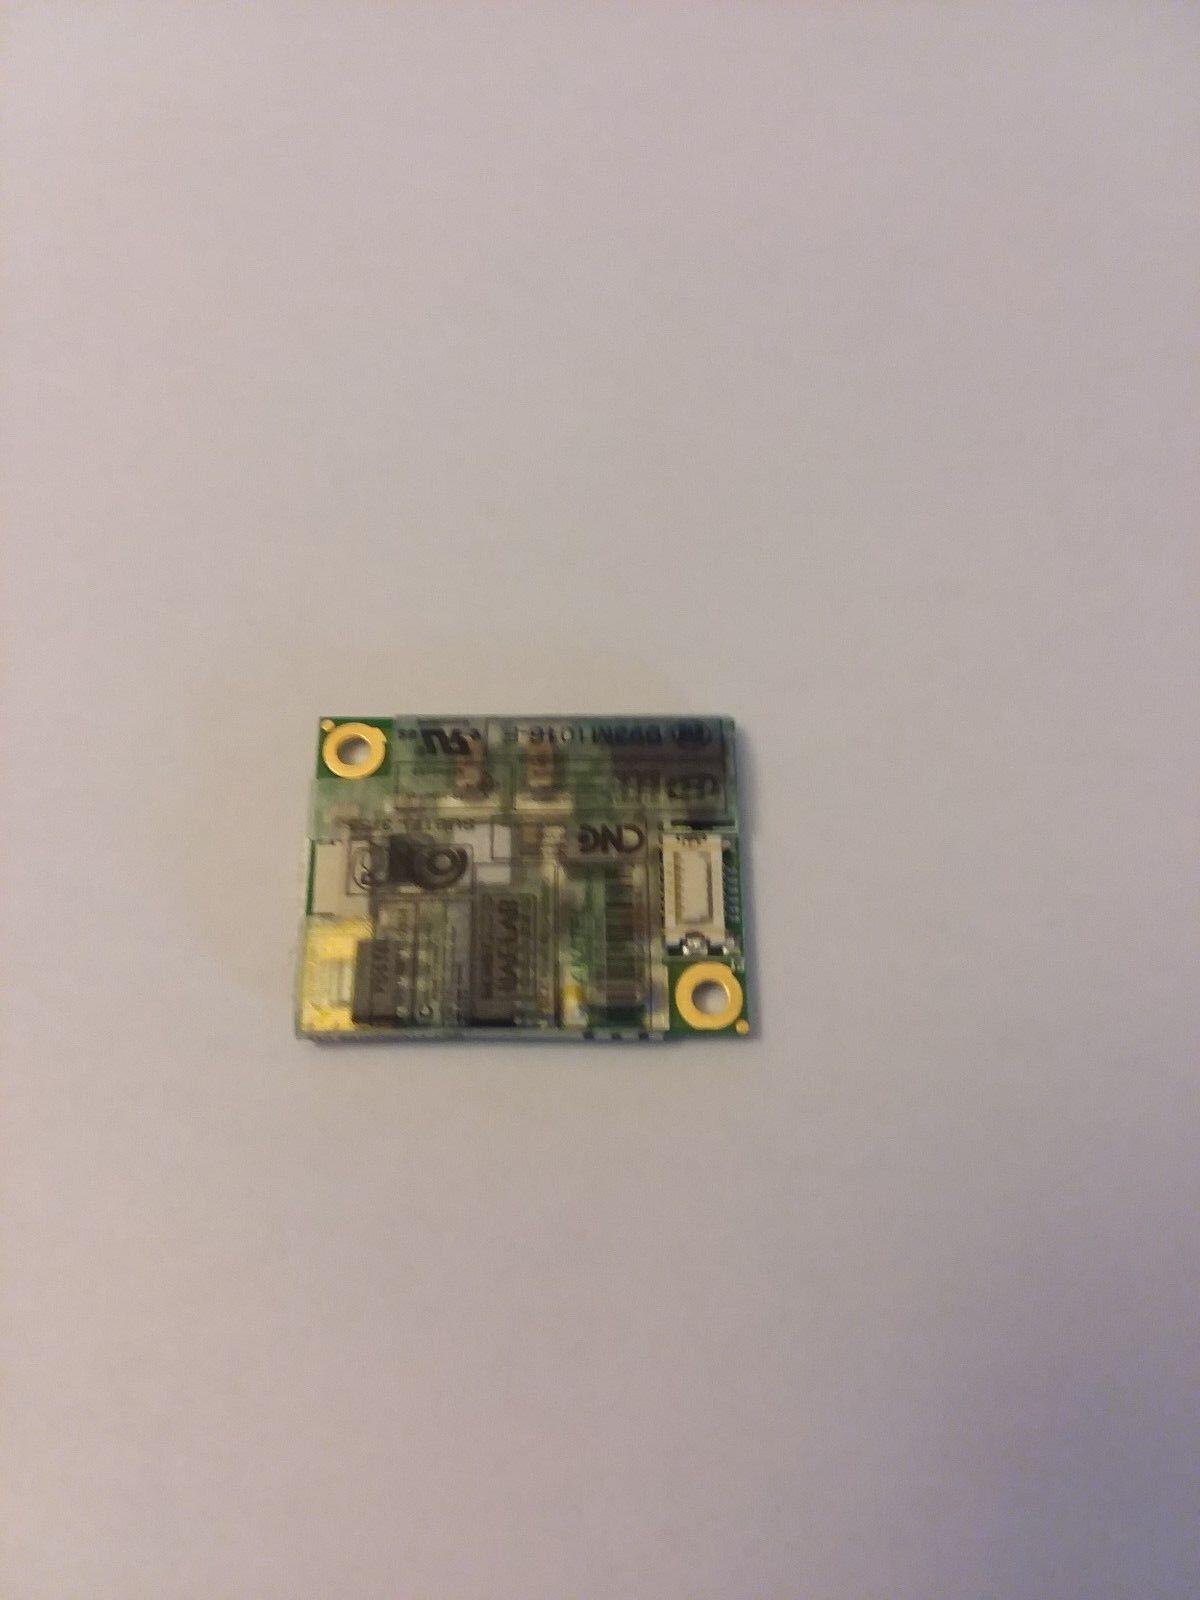 как выглядит NEW LAPTOP 56KB 56K MODEM CARD SPS-418849-001 399441-001 397580-001 фото